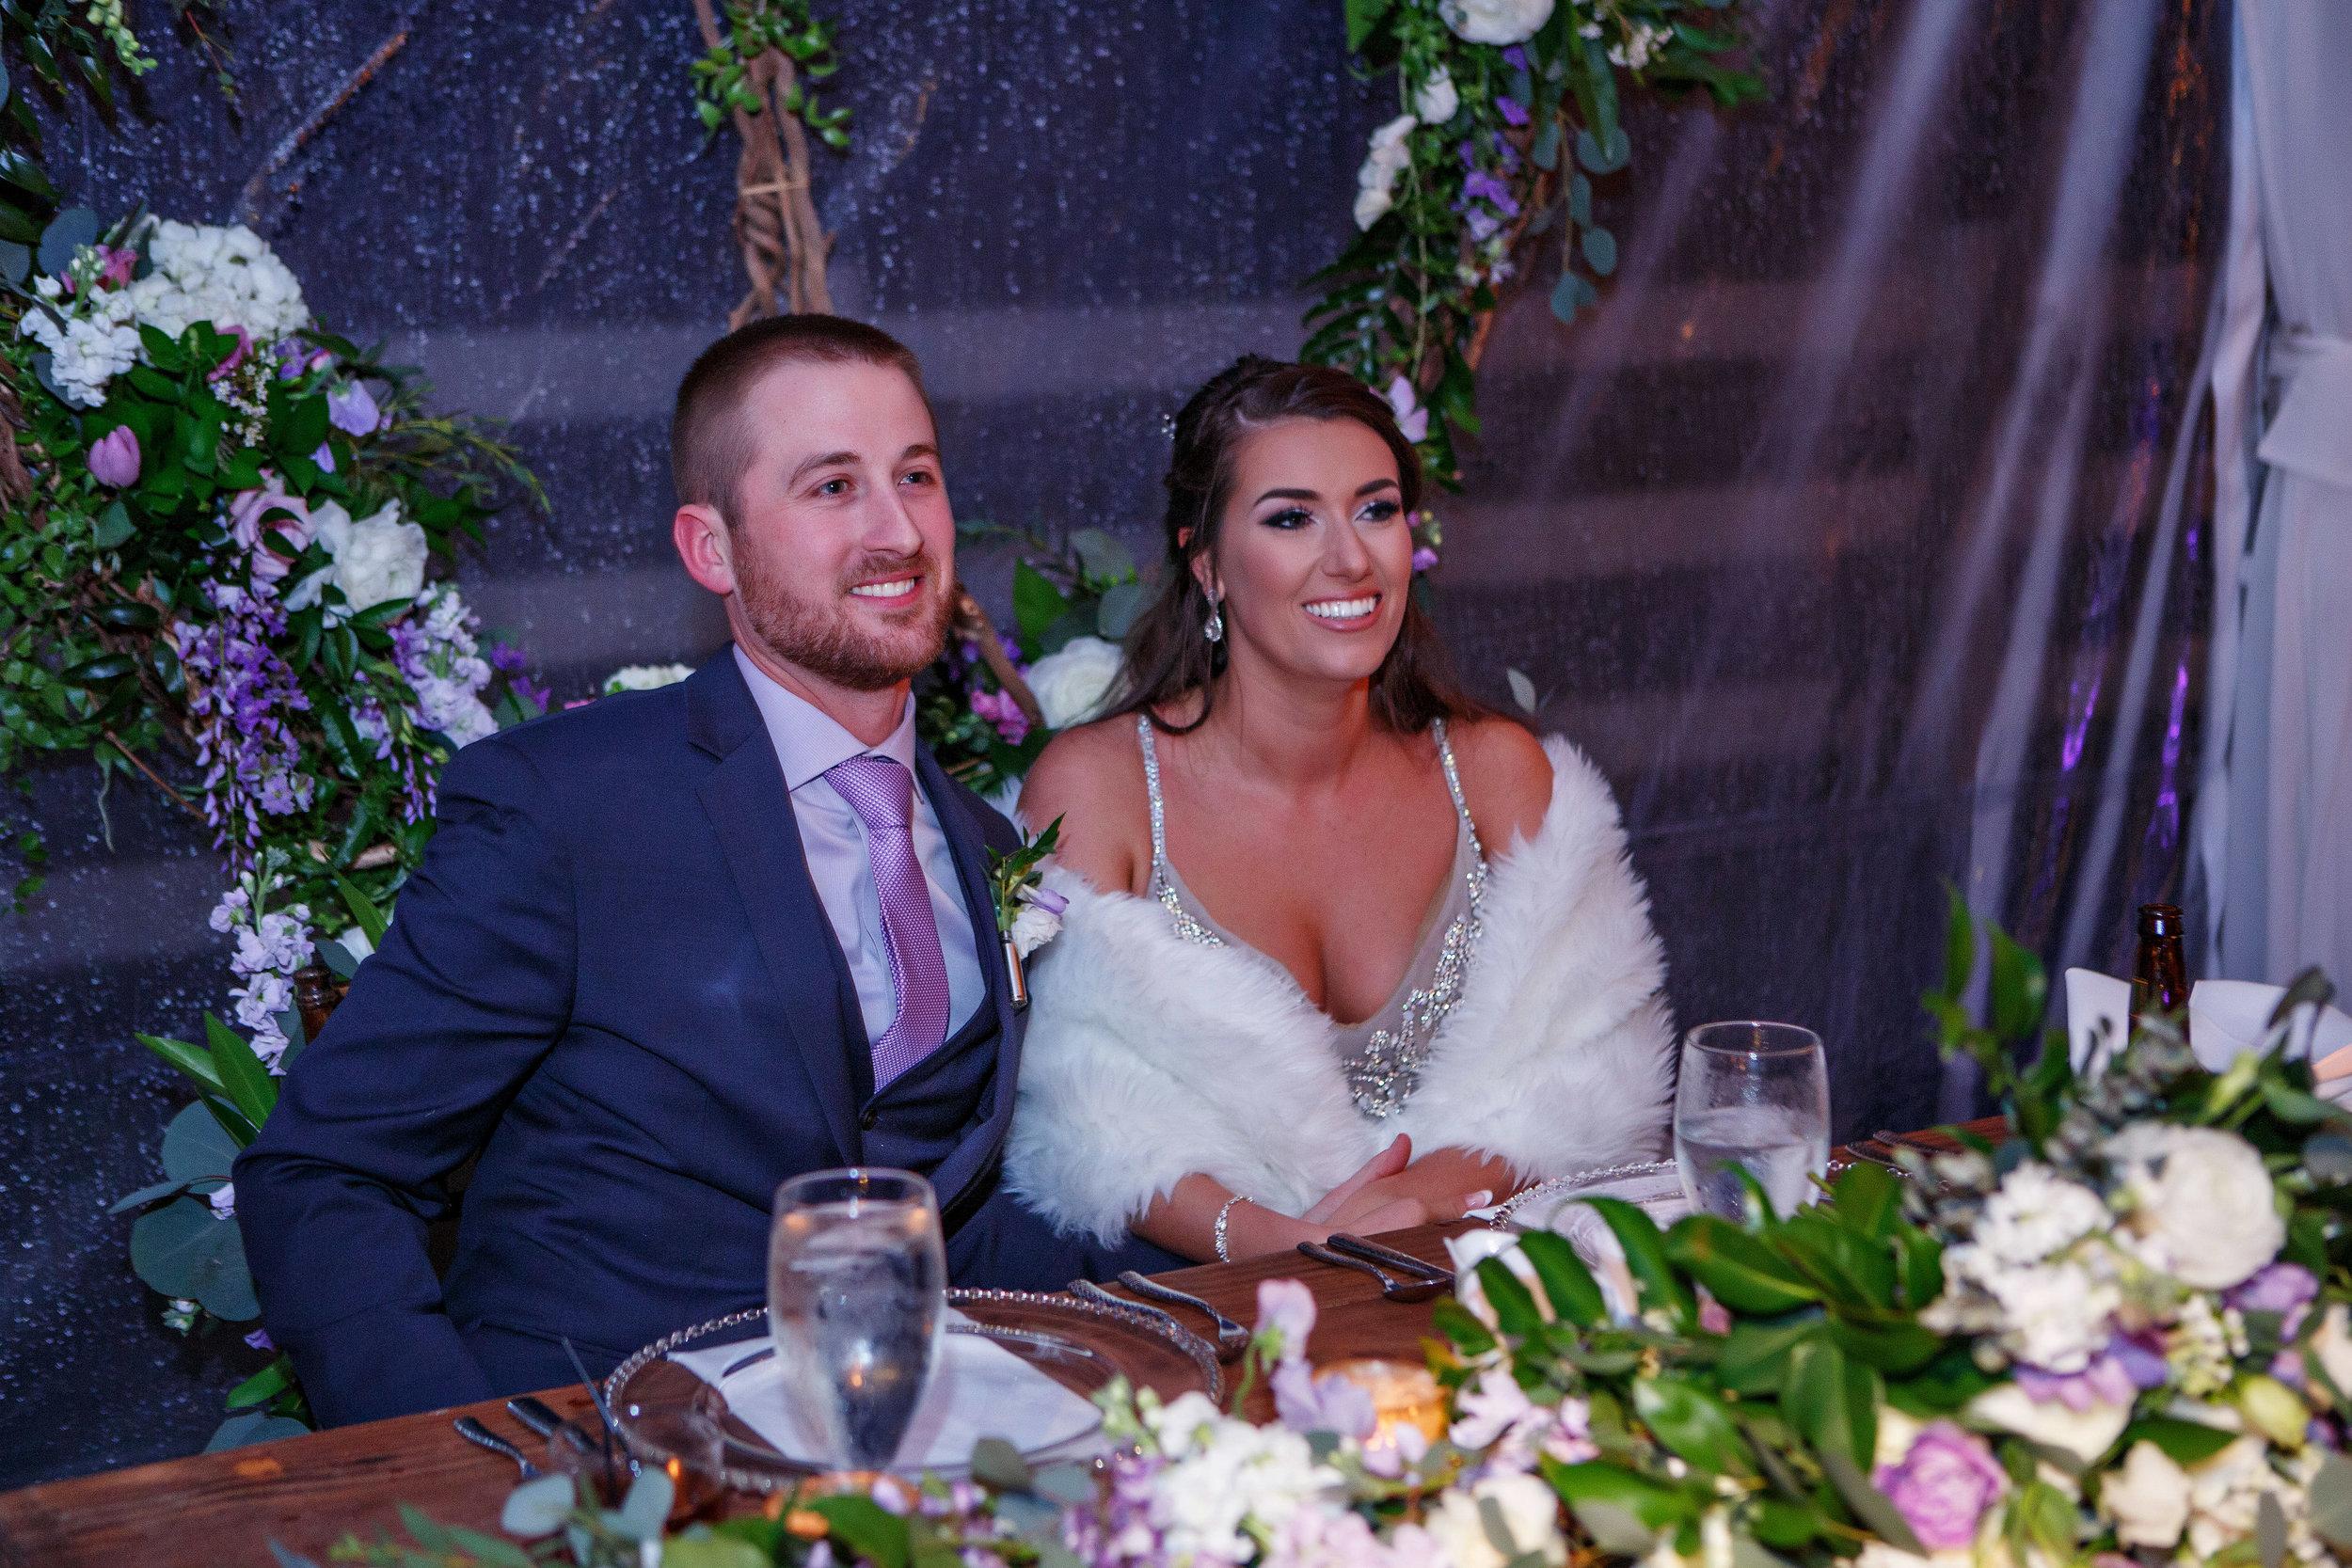 brookeandalex-wedding-728.jpg